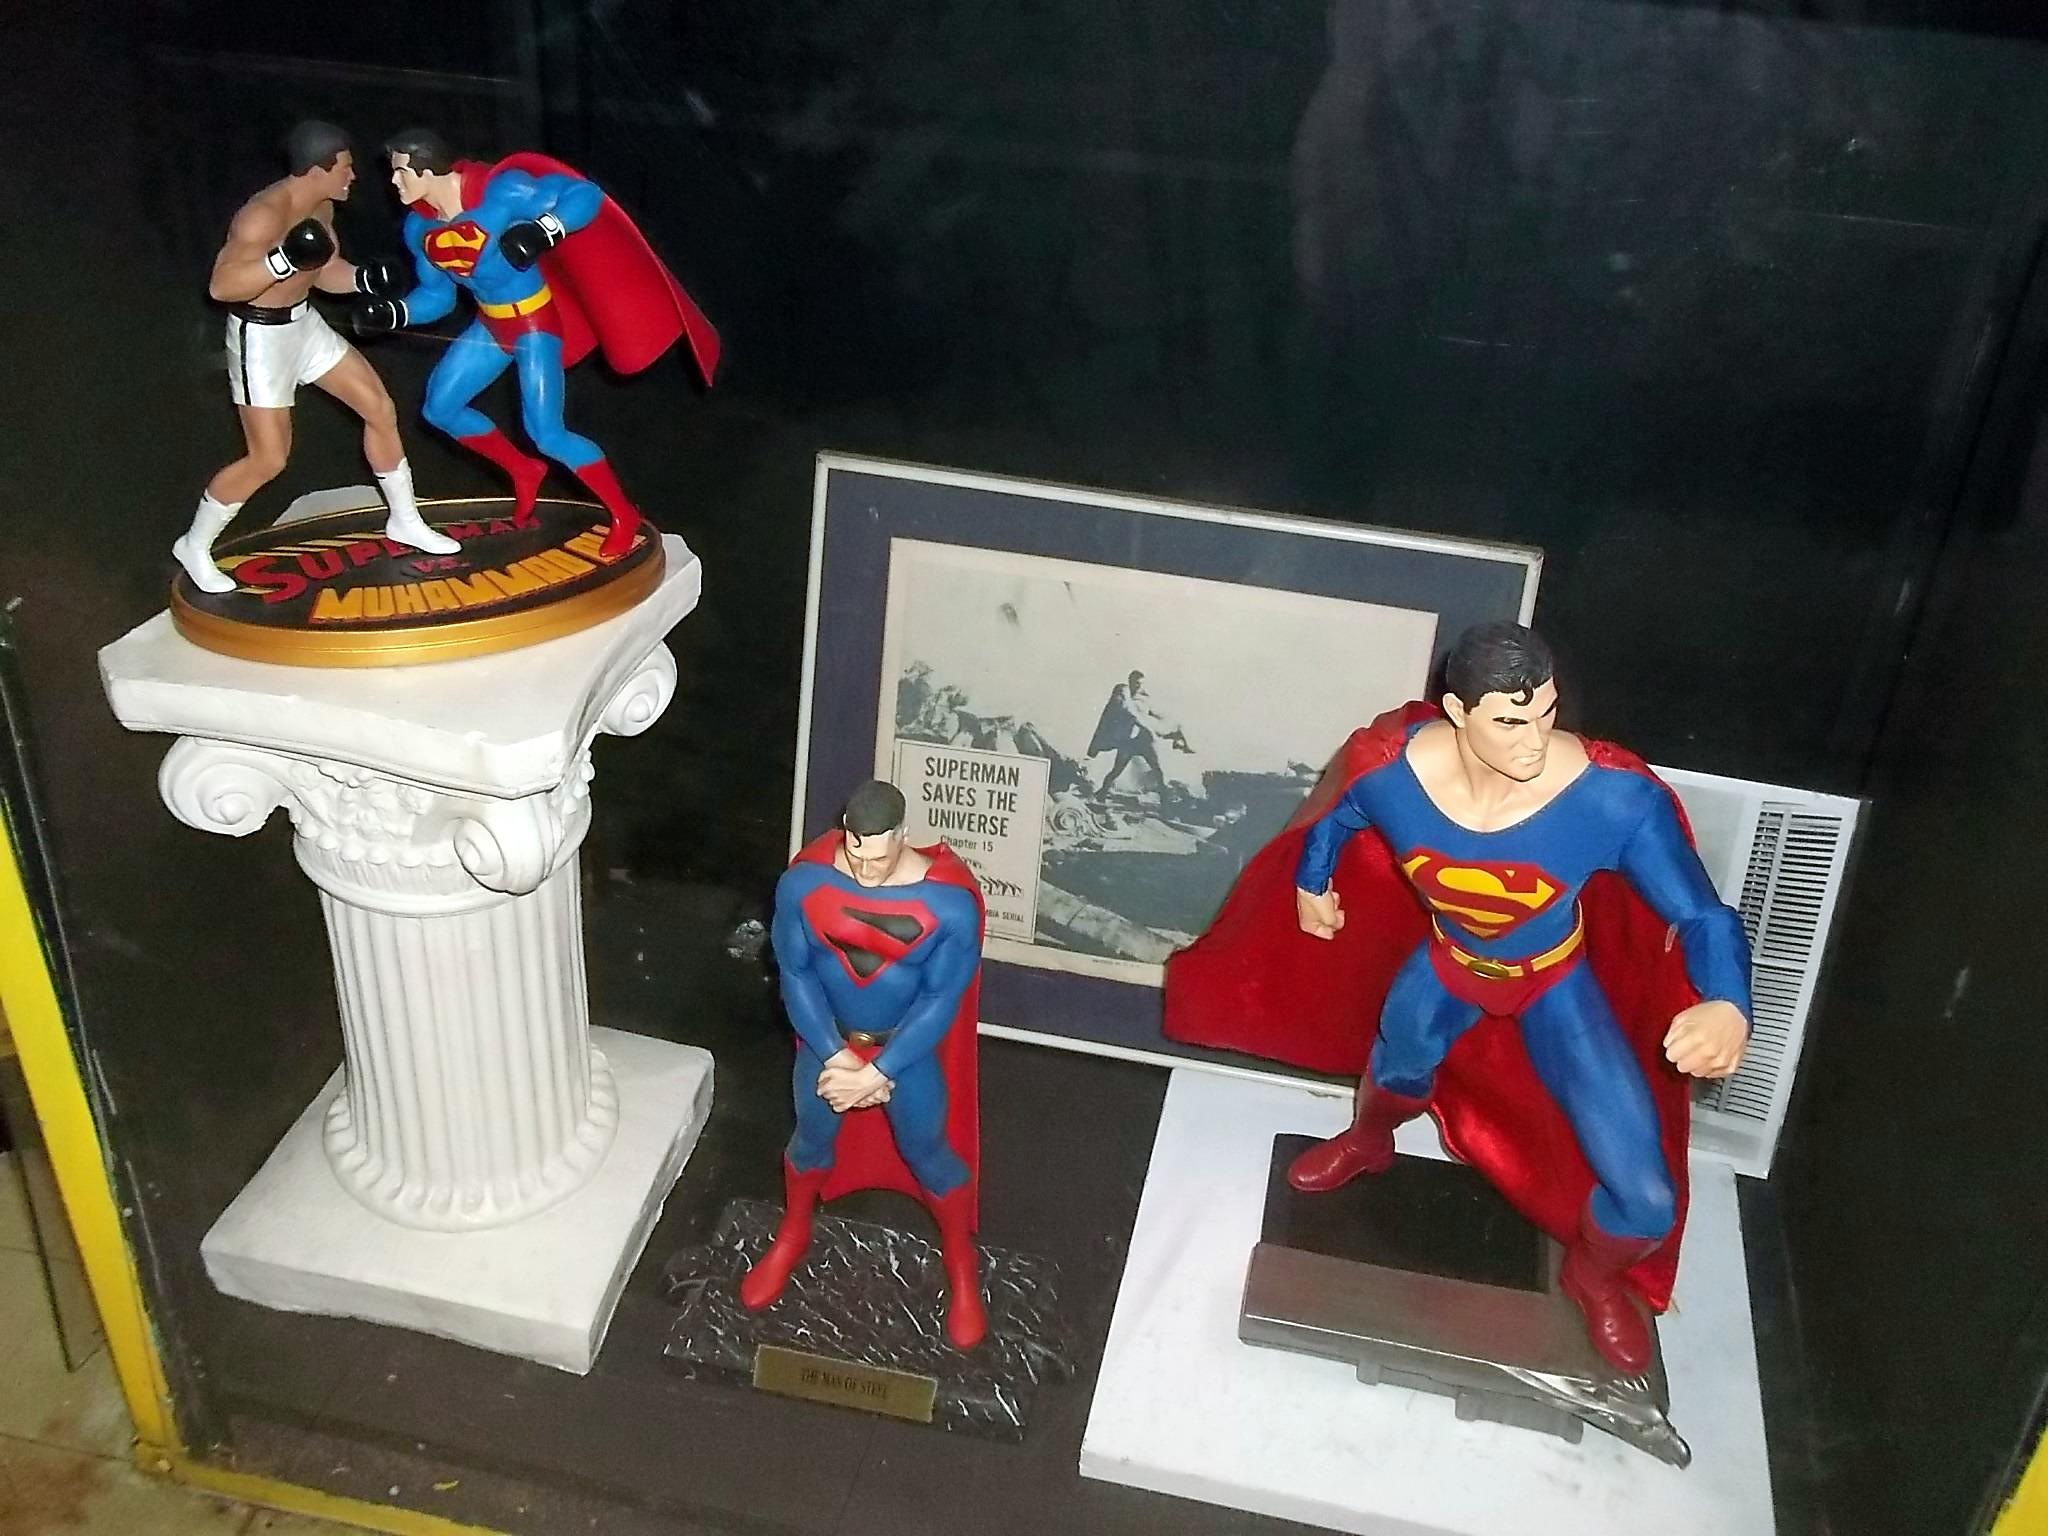 Superman figurine collection in the Super Museum in Metropolis, illinois.